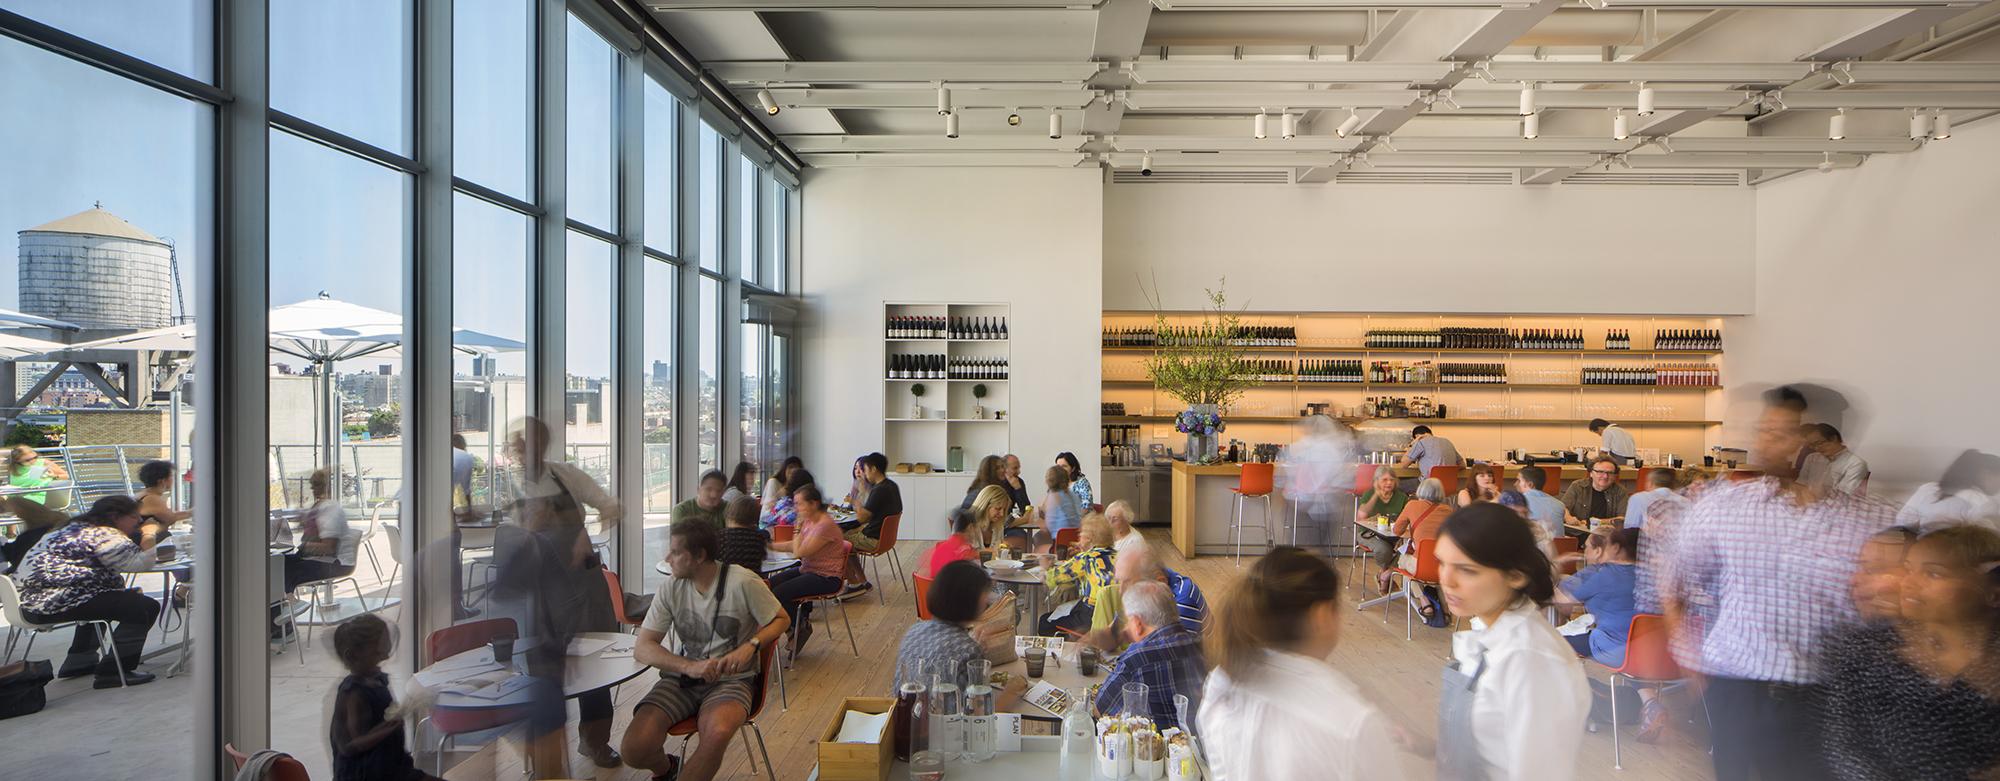 renzo piano building workshop | whitney museum of american art | new york usa